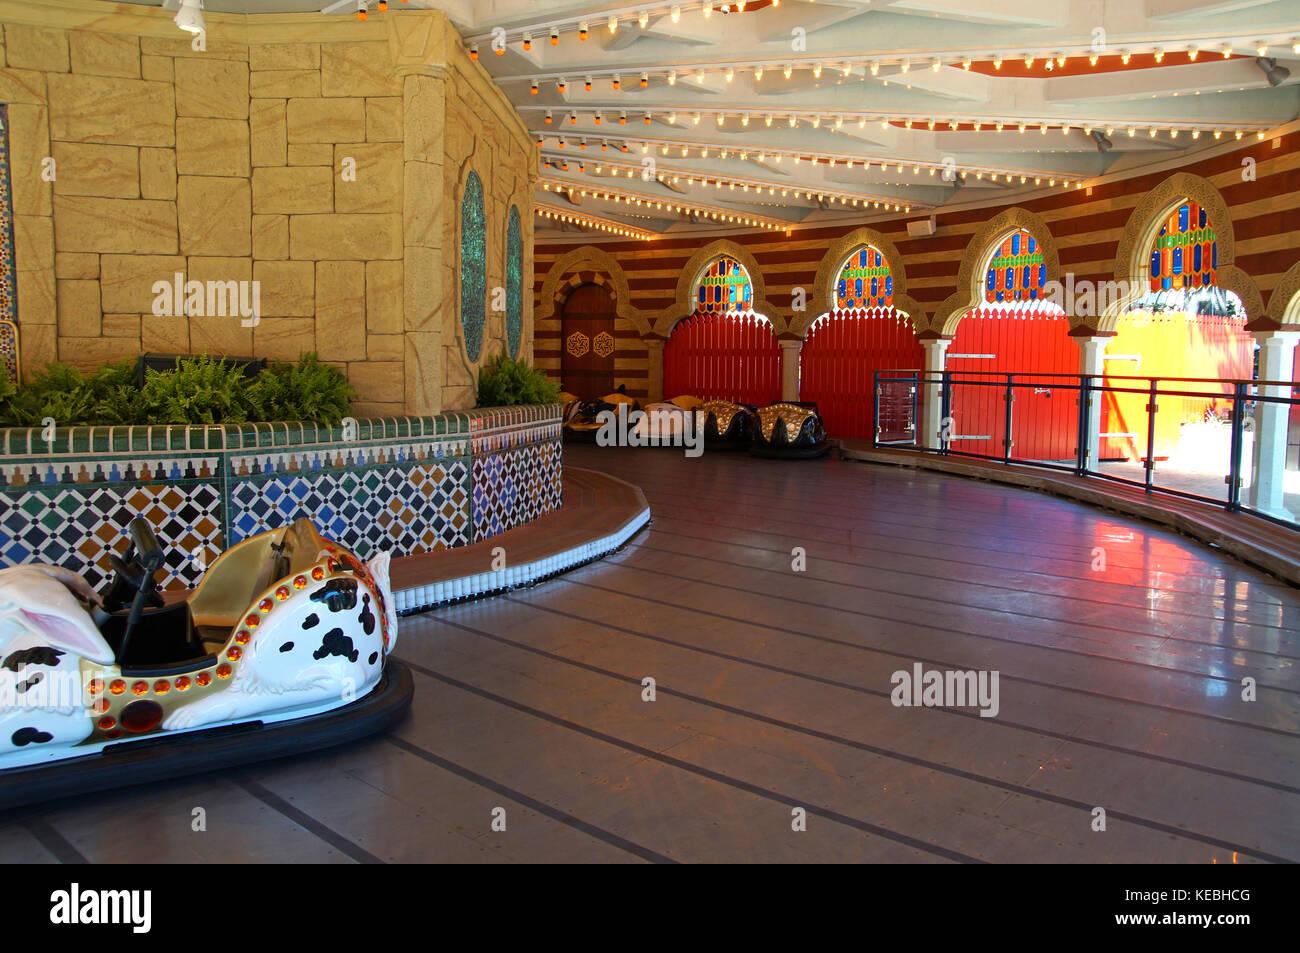 Bumper cars in amusement park of Tivoli Gardens in Copenhaguen - Stock Image